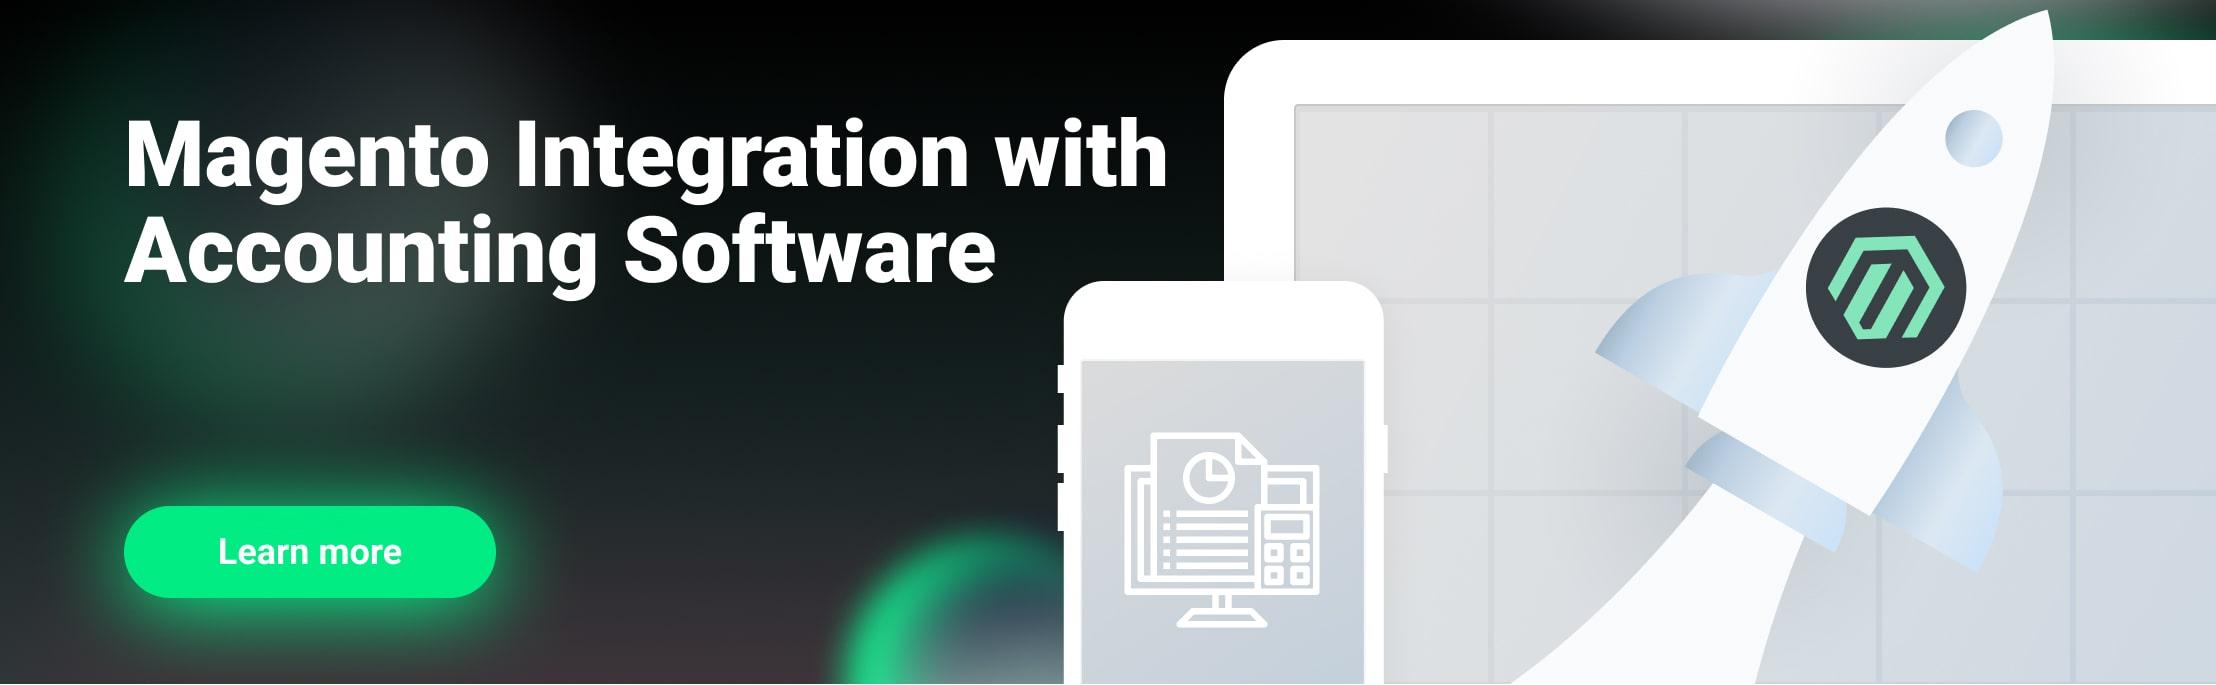 Magento accounting software integration